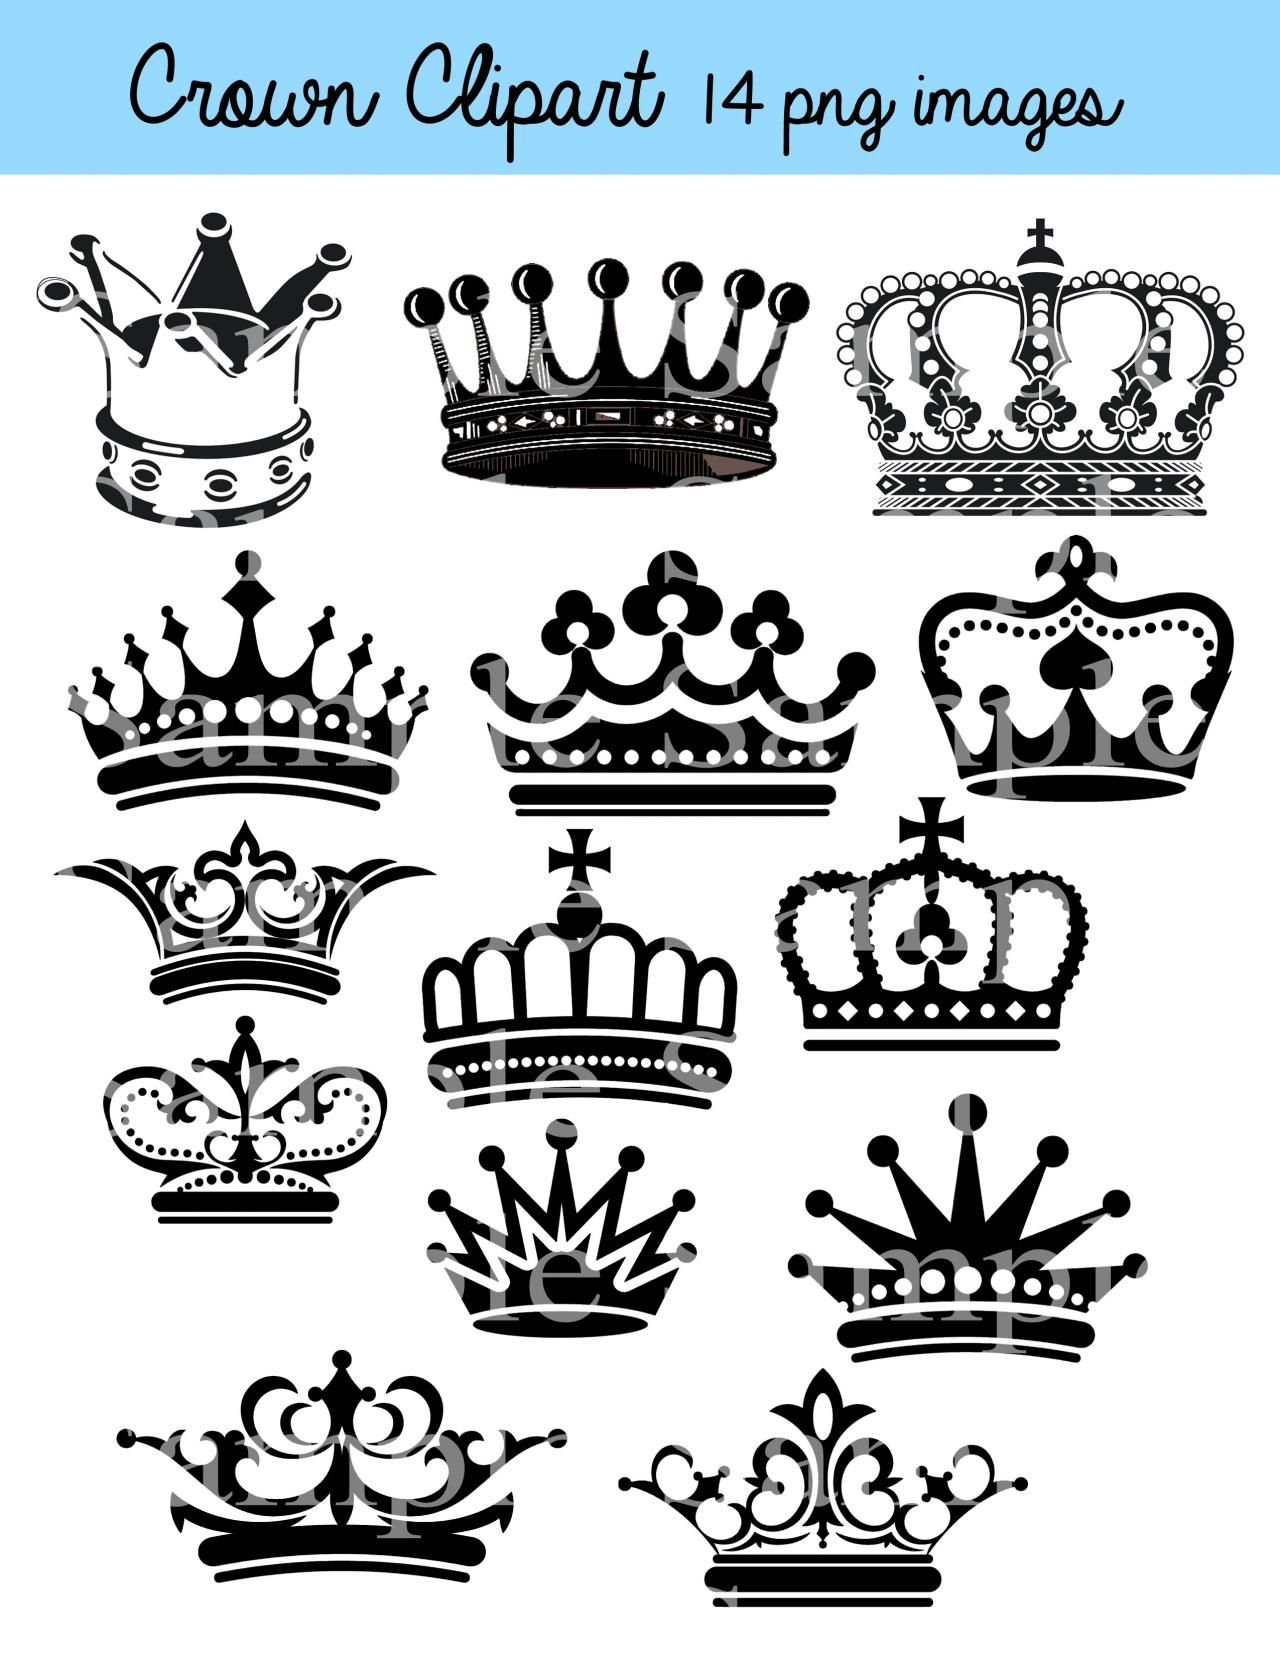 Crown Clipart Clip Art Crown Silhouette Clipart Clip Art Black Crowns Color Crowns Royal Clipart Princess Crowns Crown Clip Art Crown Silhouette Clip Art